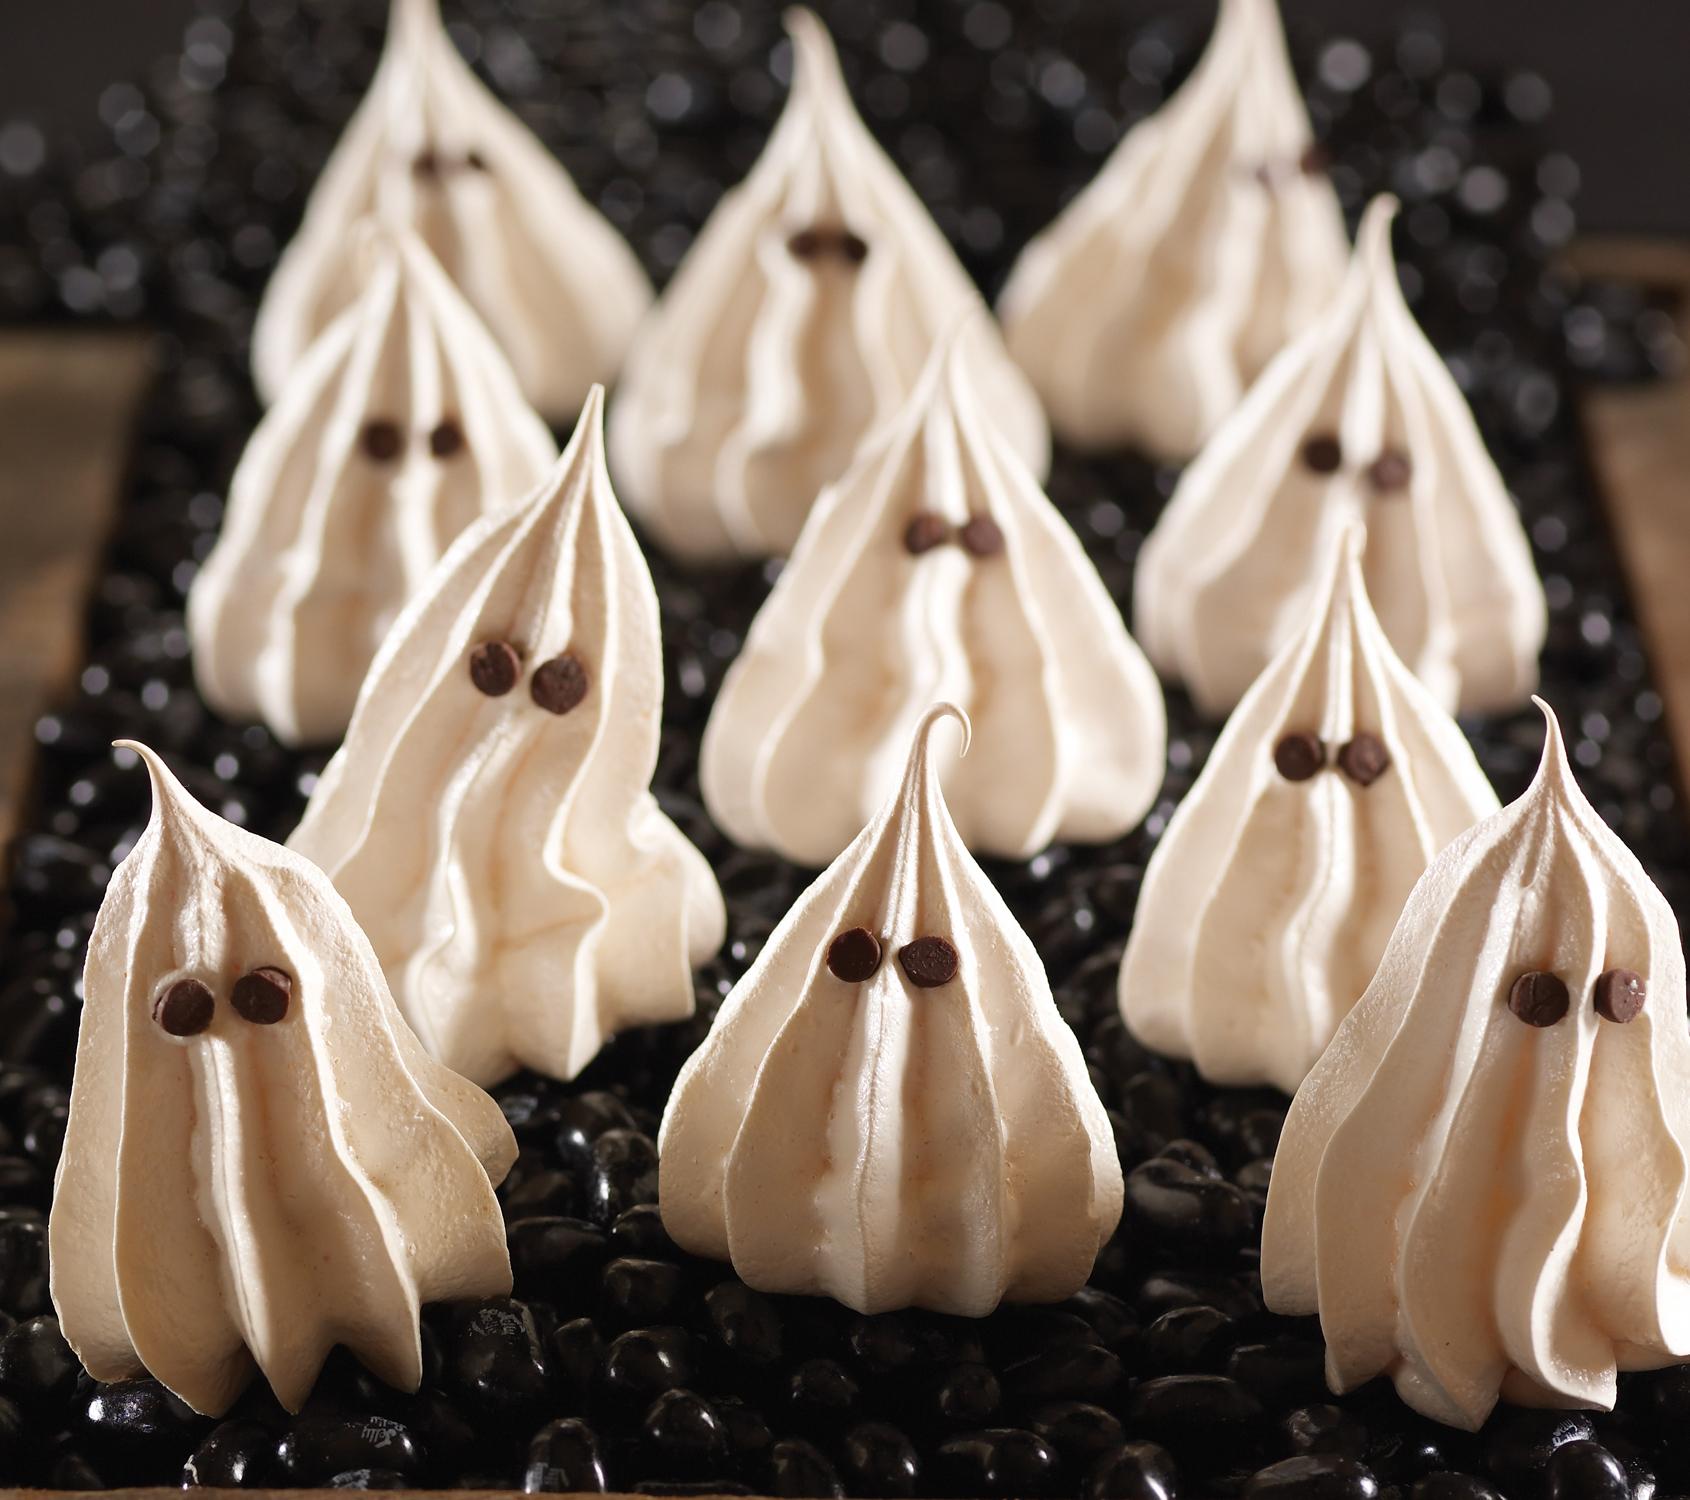 Halloween ricette spettrali per bambini for Ricette per bimbi